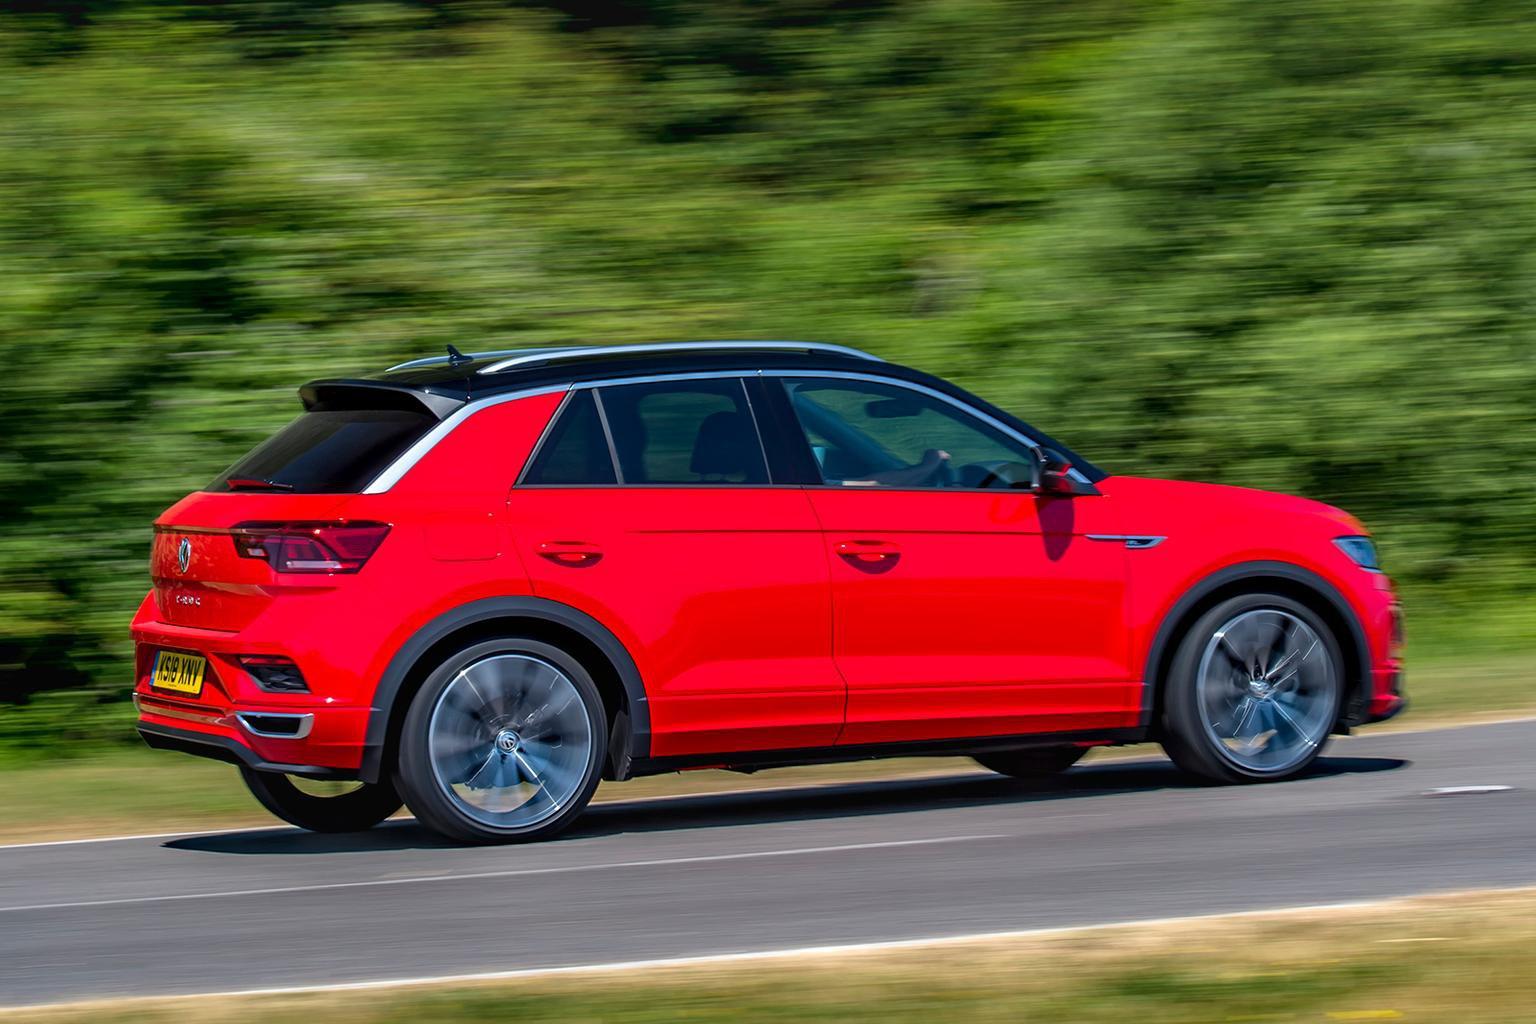 2018 Volkswagen T-Roc 1.5 TSI DSG R-Line verdict